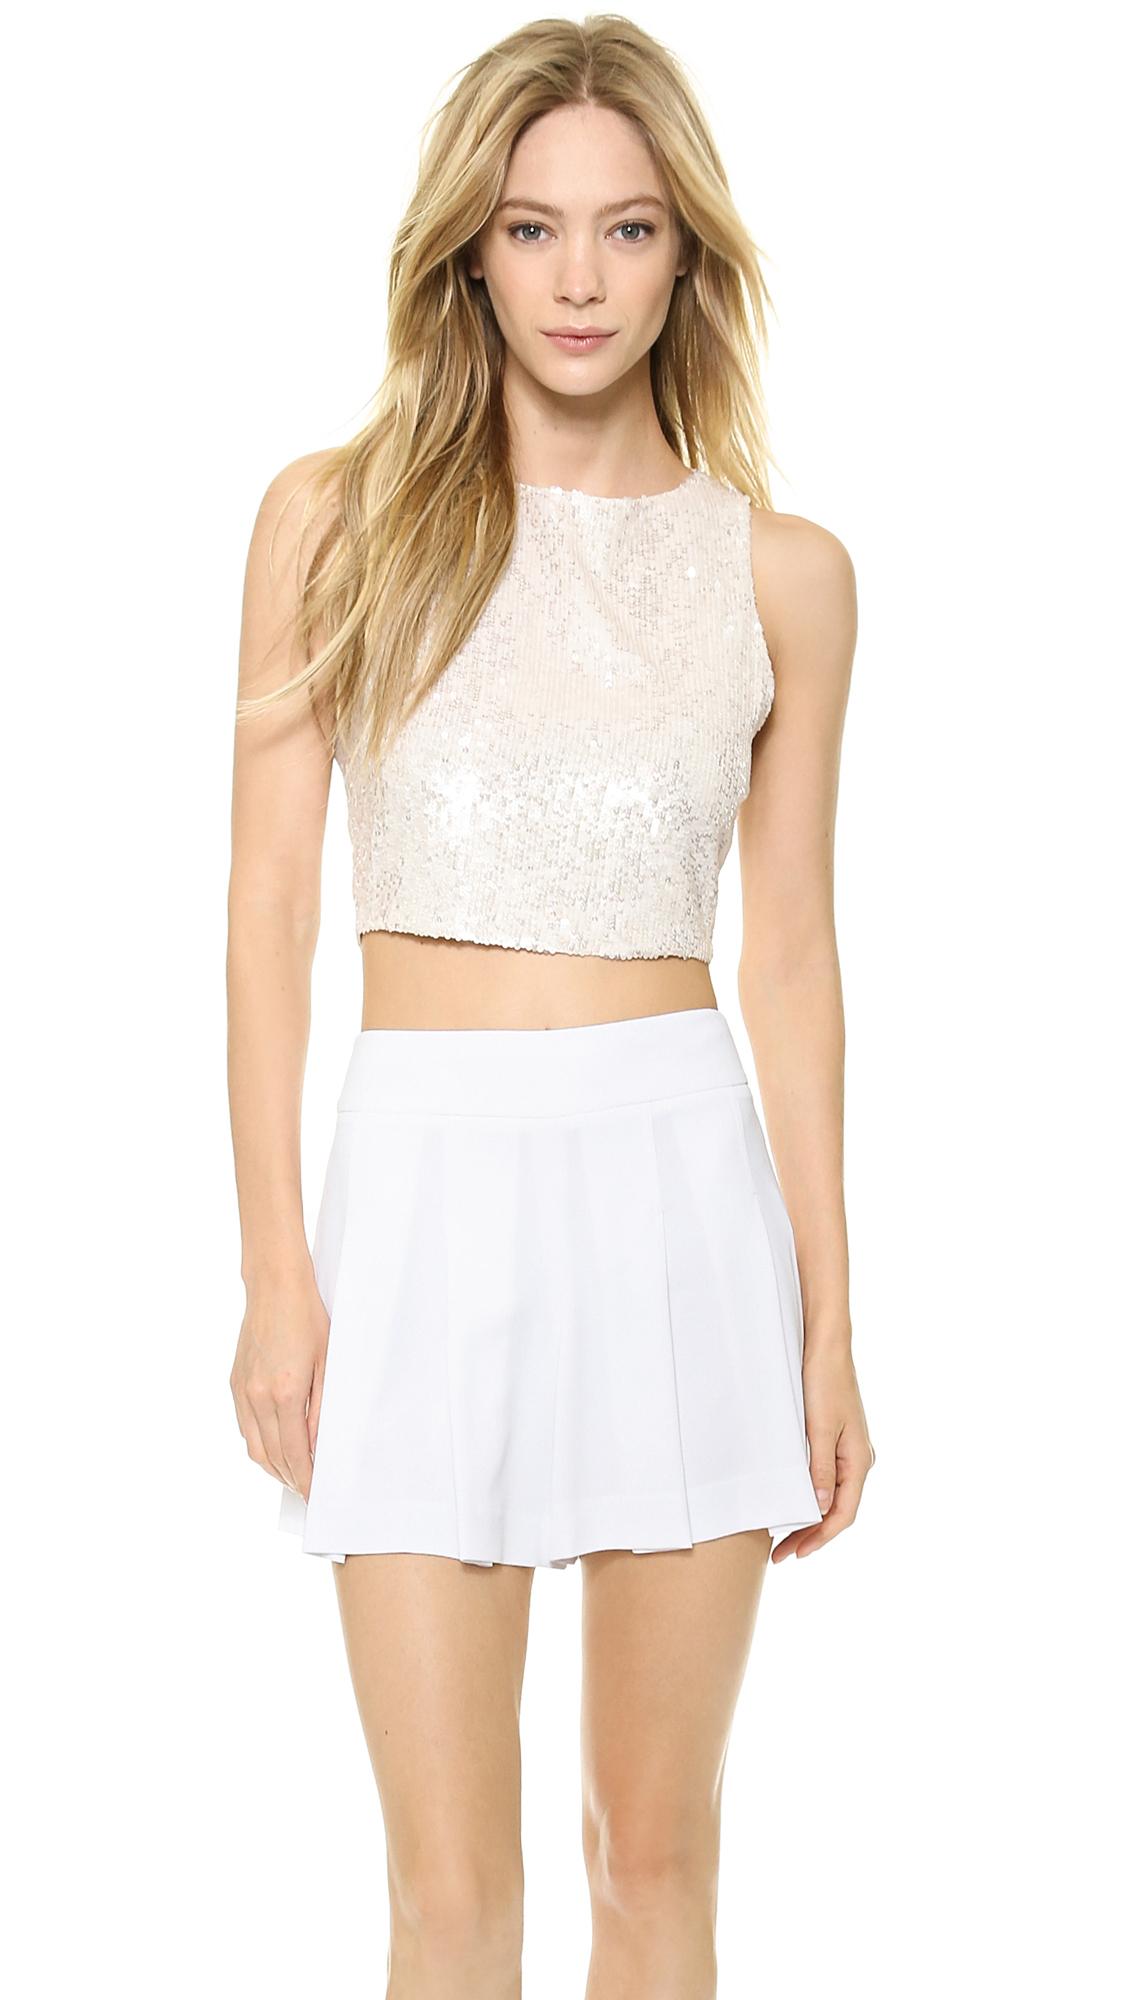 Alice Olivia Alice Olivia Pire Sequin Crop Top White In